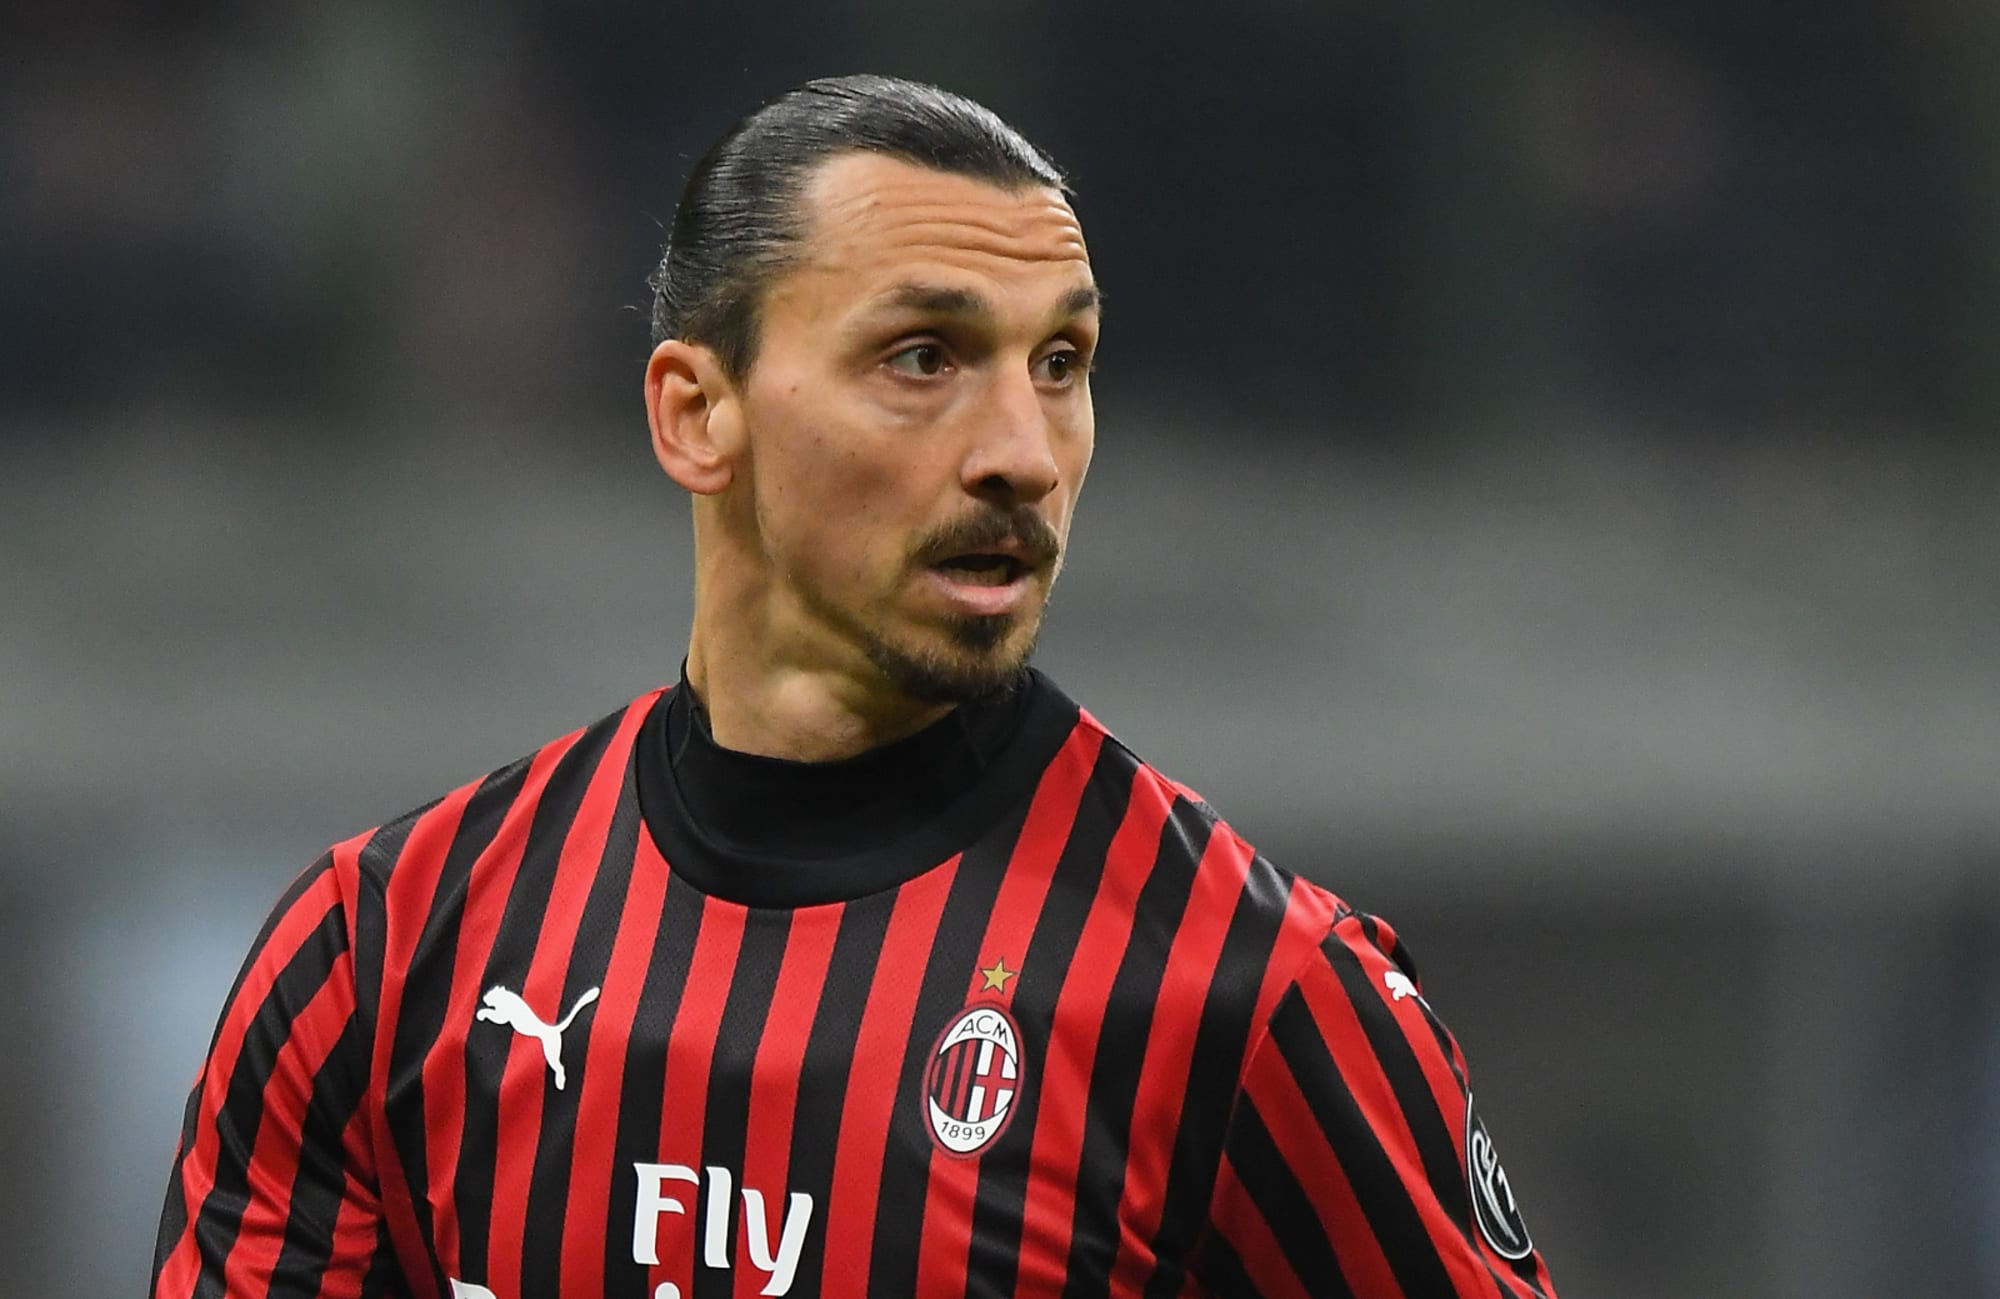 Ac Milan Have Zlatan Ibrahimovic But Inter Have Real Plan For Success